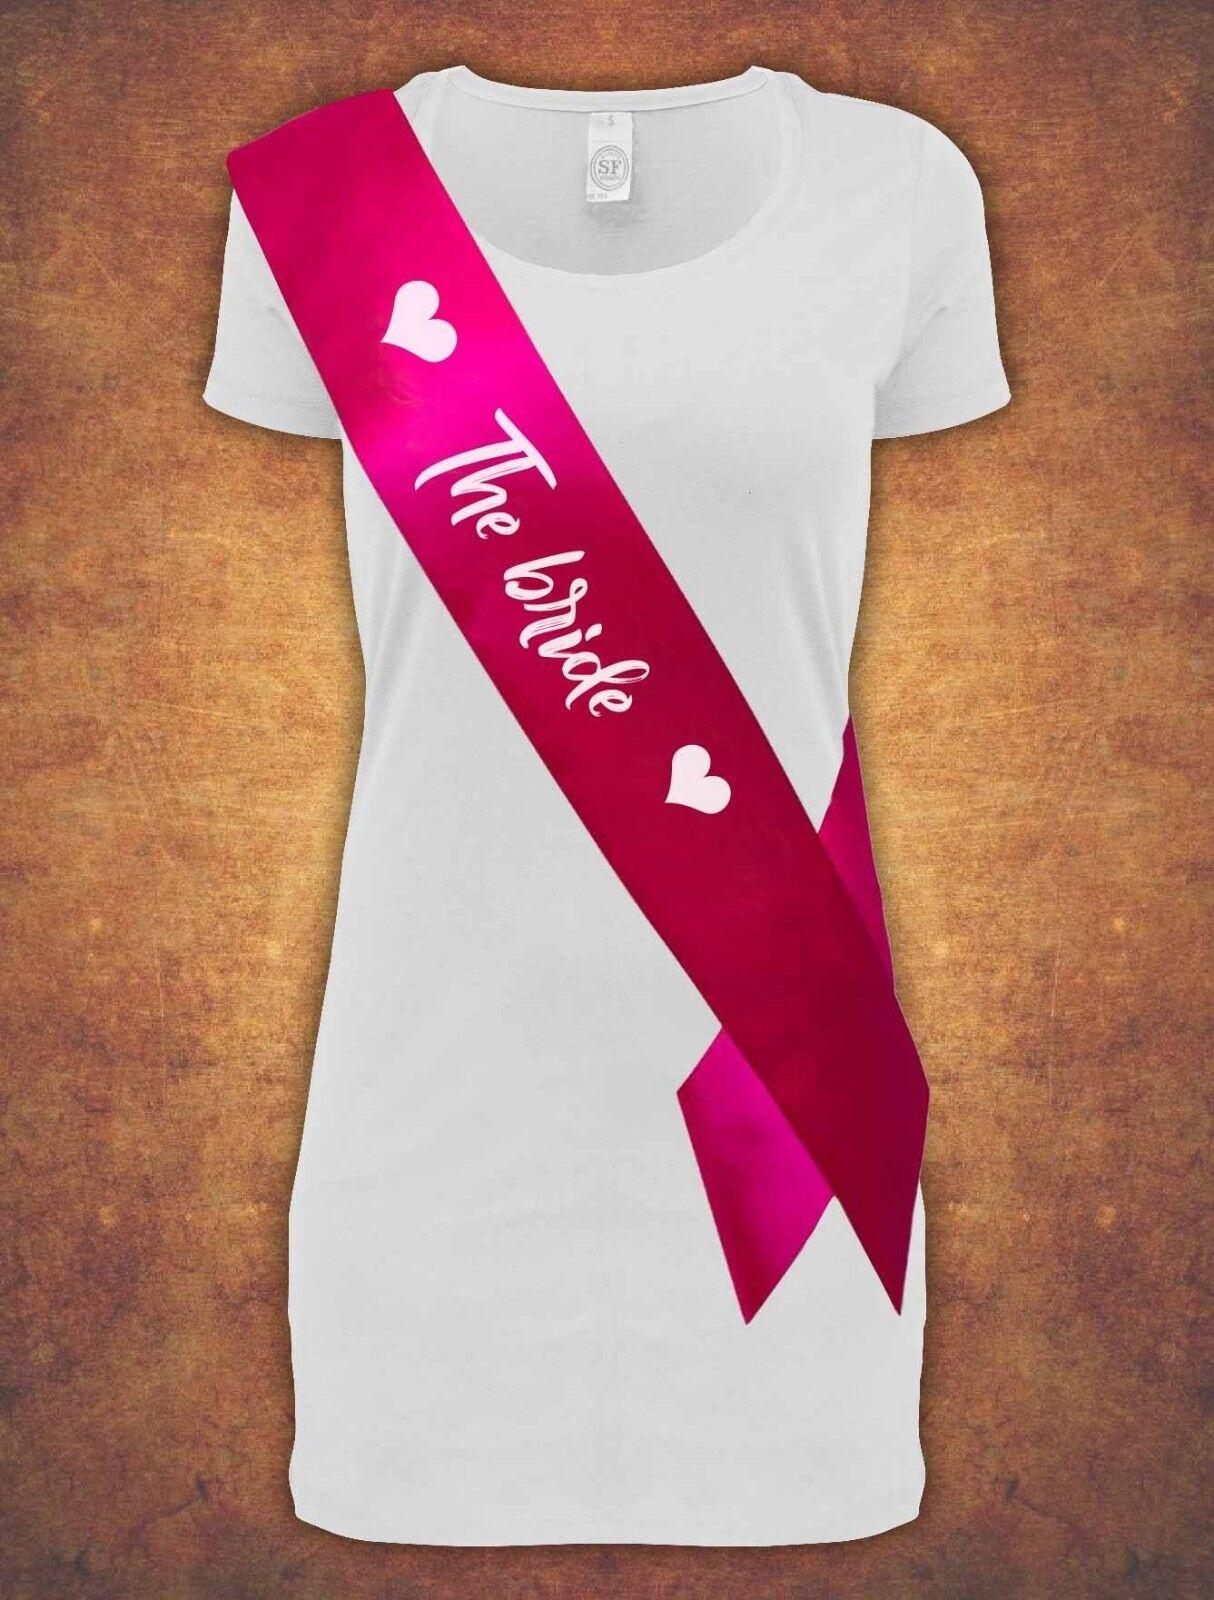 The Bride Hen Night Bachelorette Bridal Shower UK Party 2019 Pink